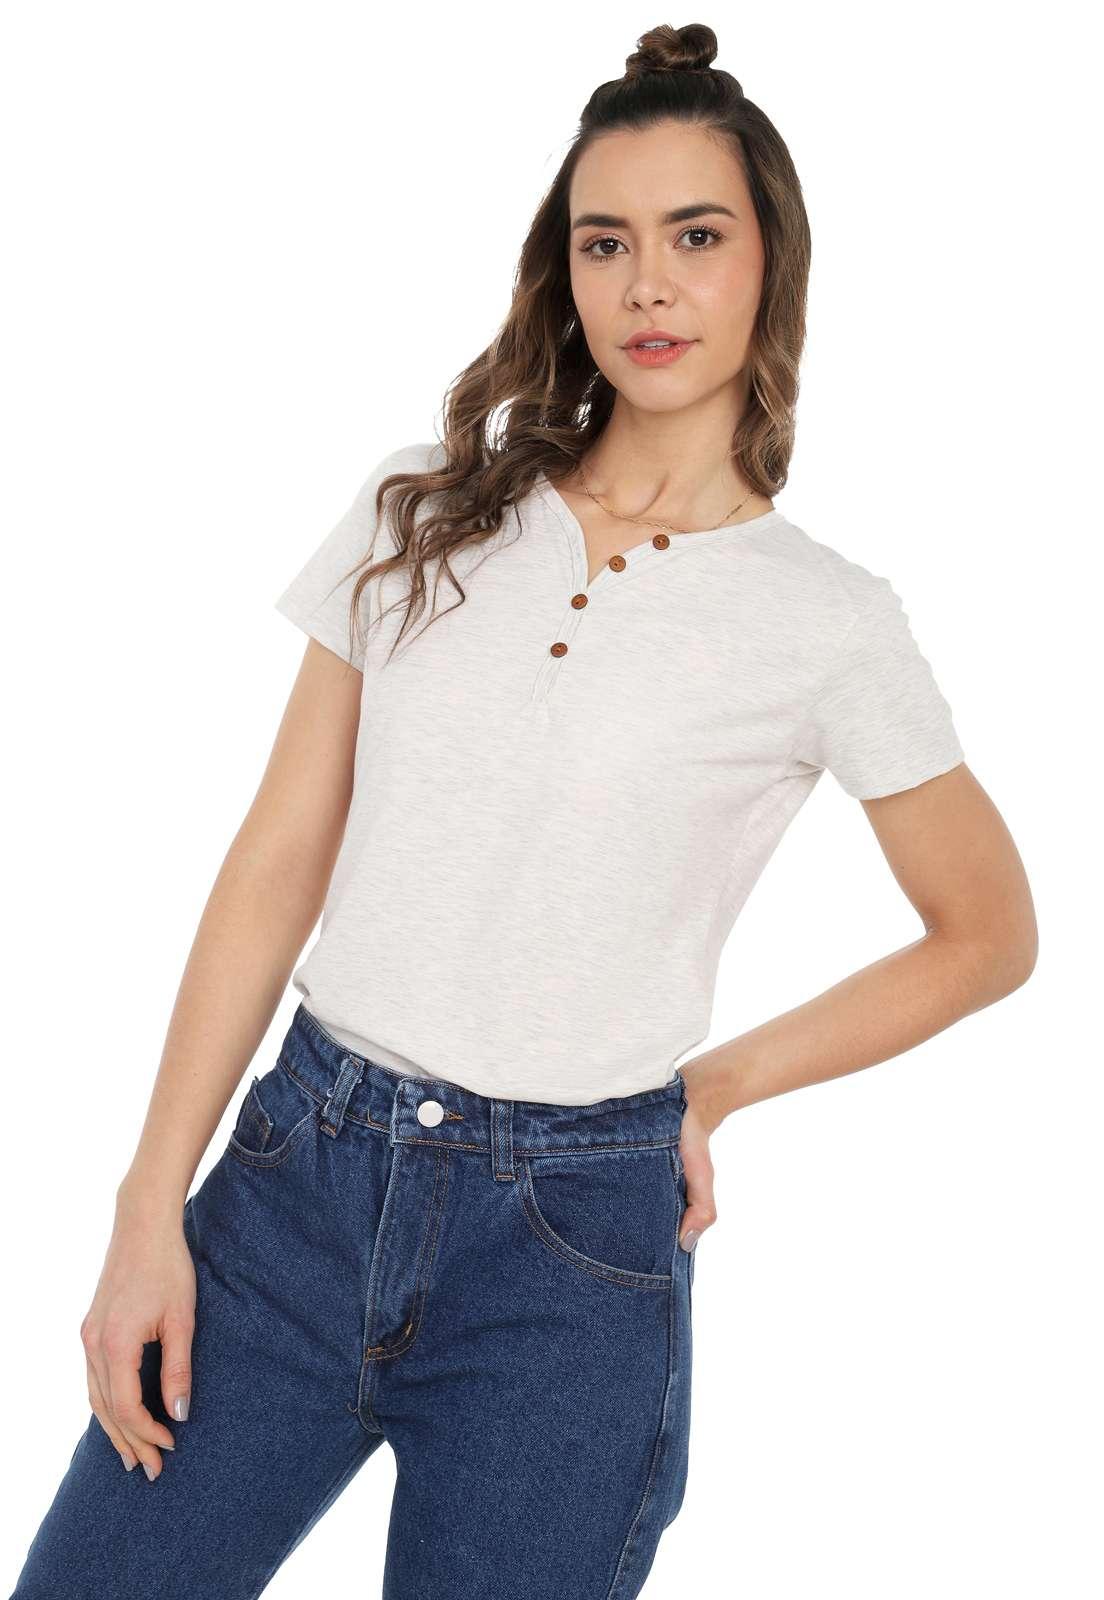 Camiseta Mujer Con Botones Licrada - Marfil | Polovers